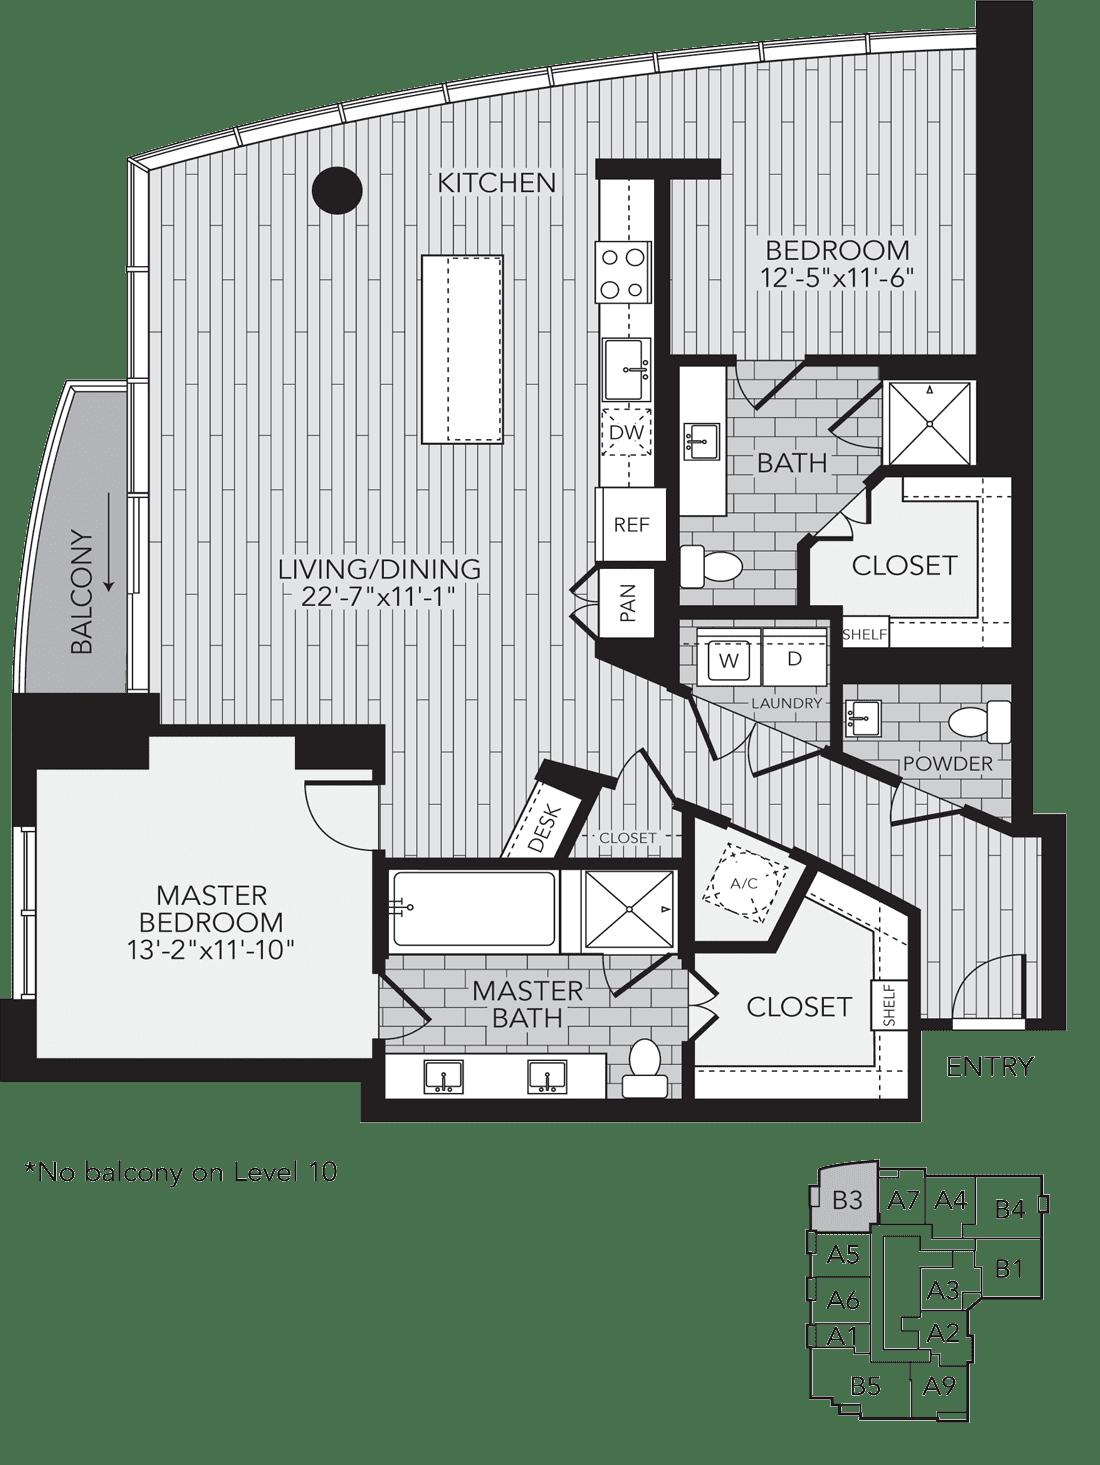 B3 Houston Two Bedroom Apartment Floor Plan